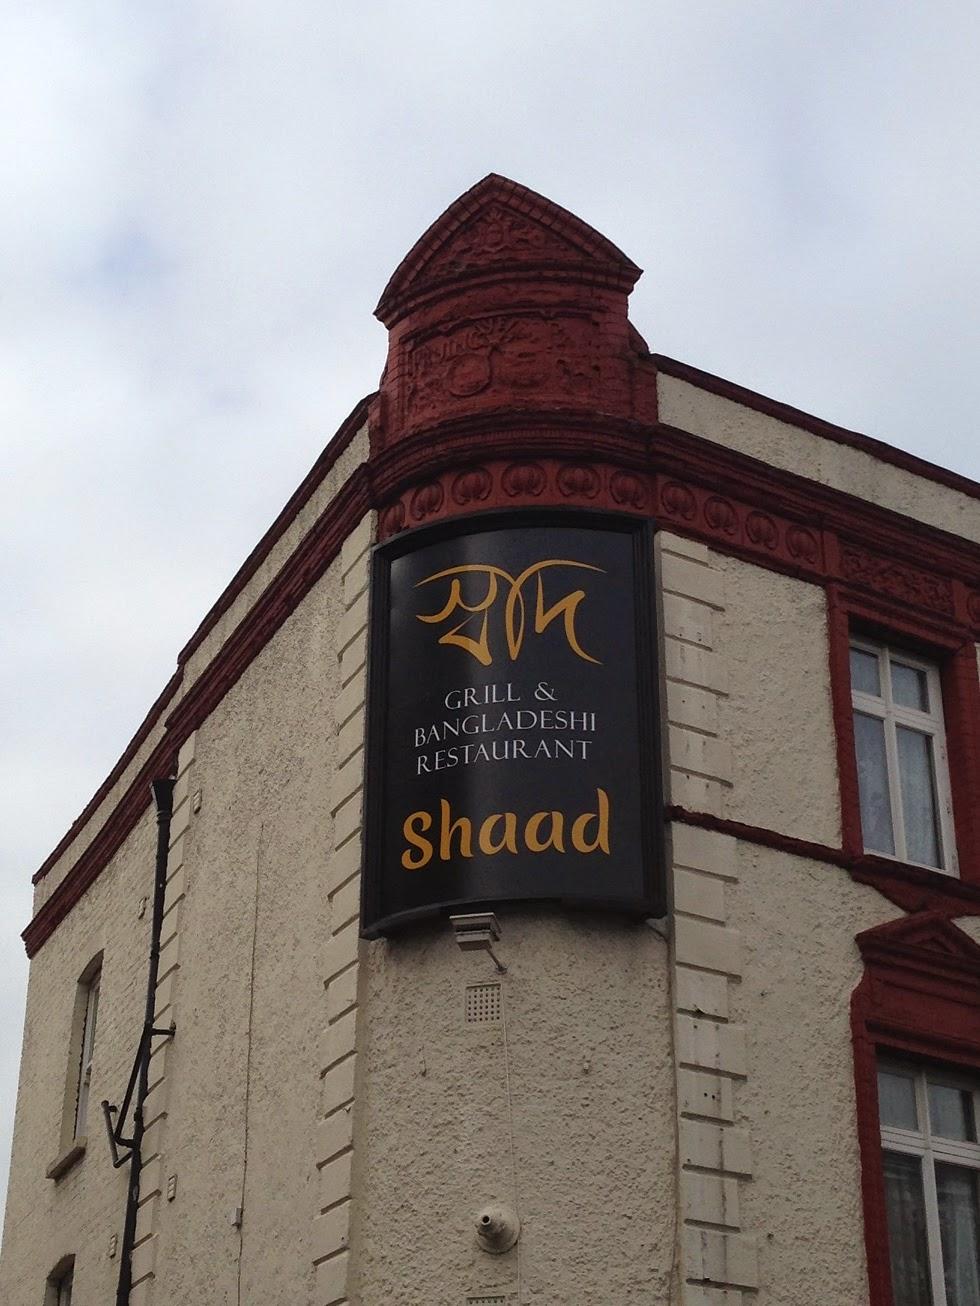 Shoreditch London: Another Return Urban Wander Around Shoreditch, London